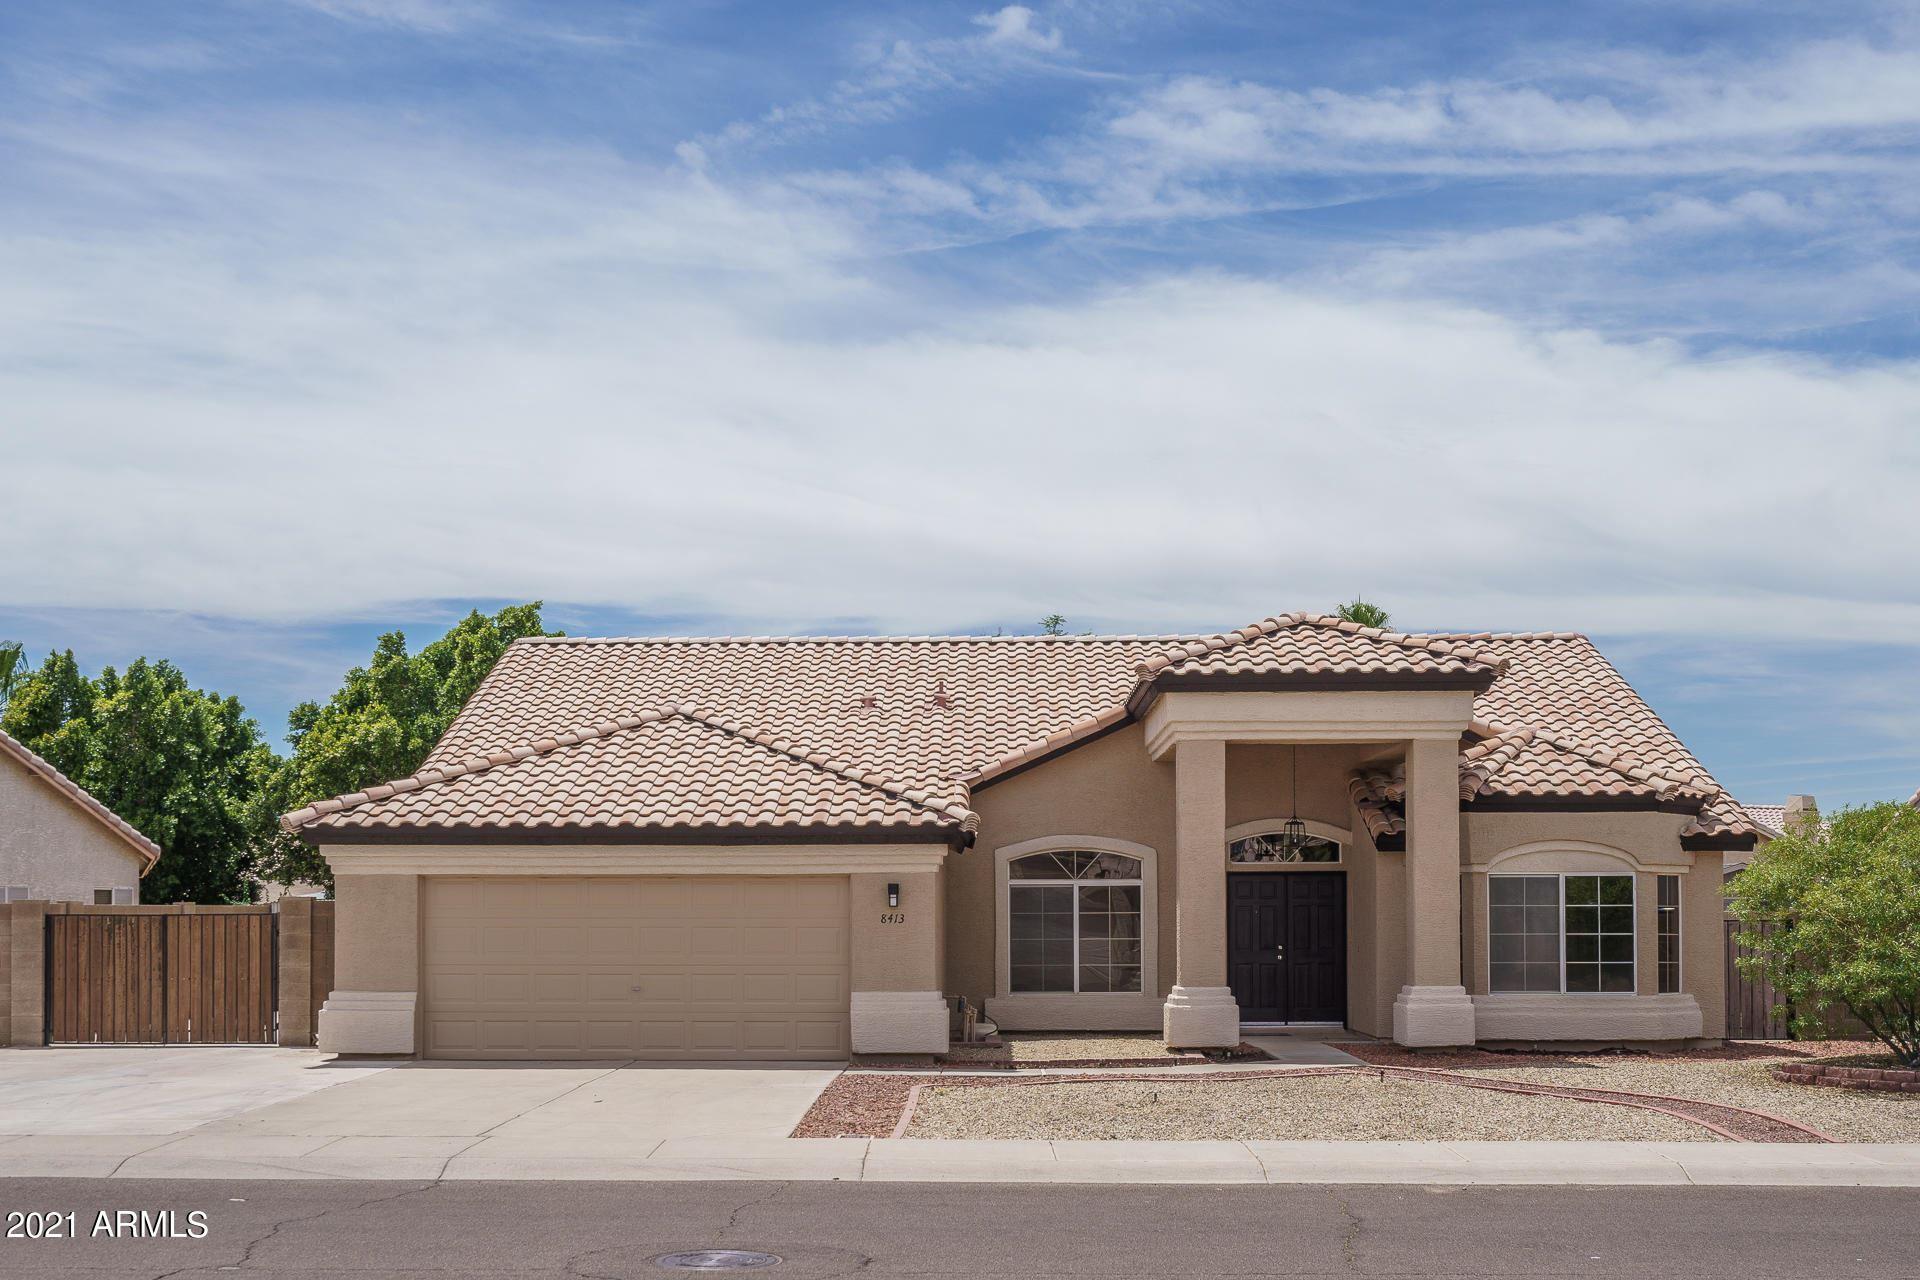 Photo of 8413 W FULLAM Street, Peoria, AZ 85382 (MLS # 6249531)